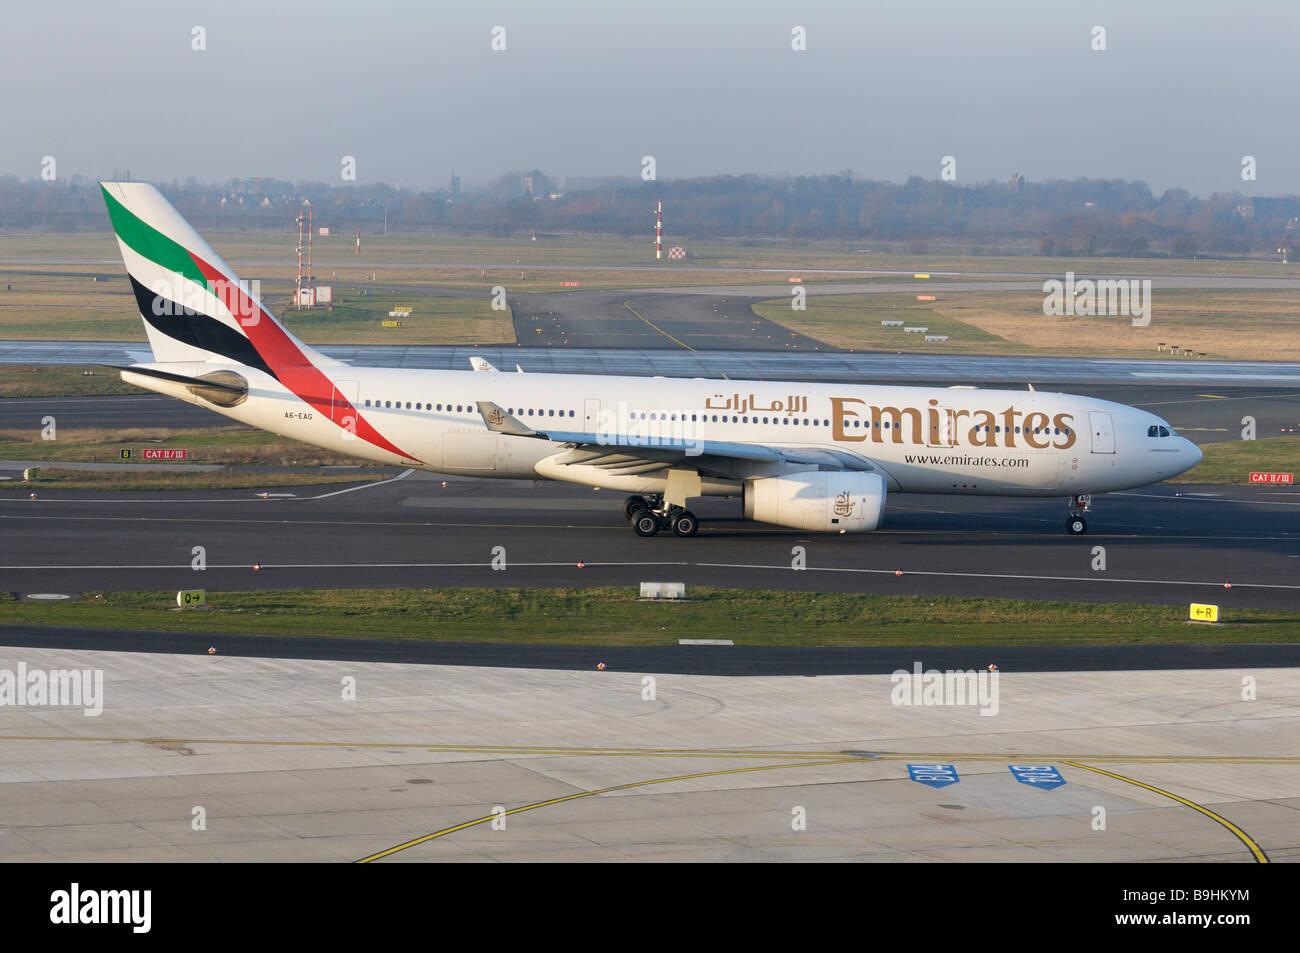 Emirates airliner on the runway, Duesseldorf International Airport, North Rhine-Westphalia, Germany, Europe - Stock Image